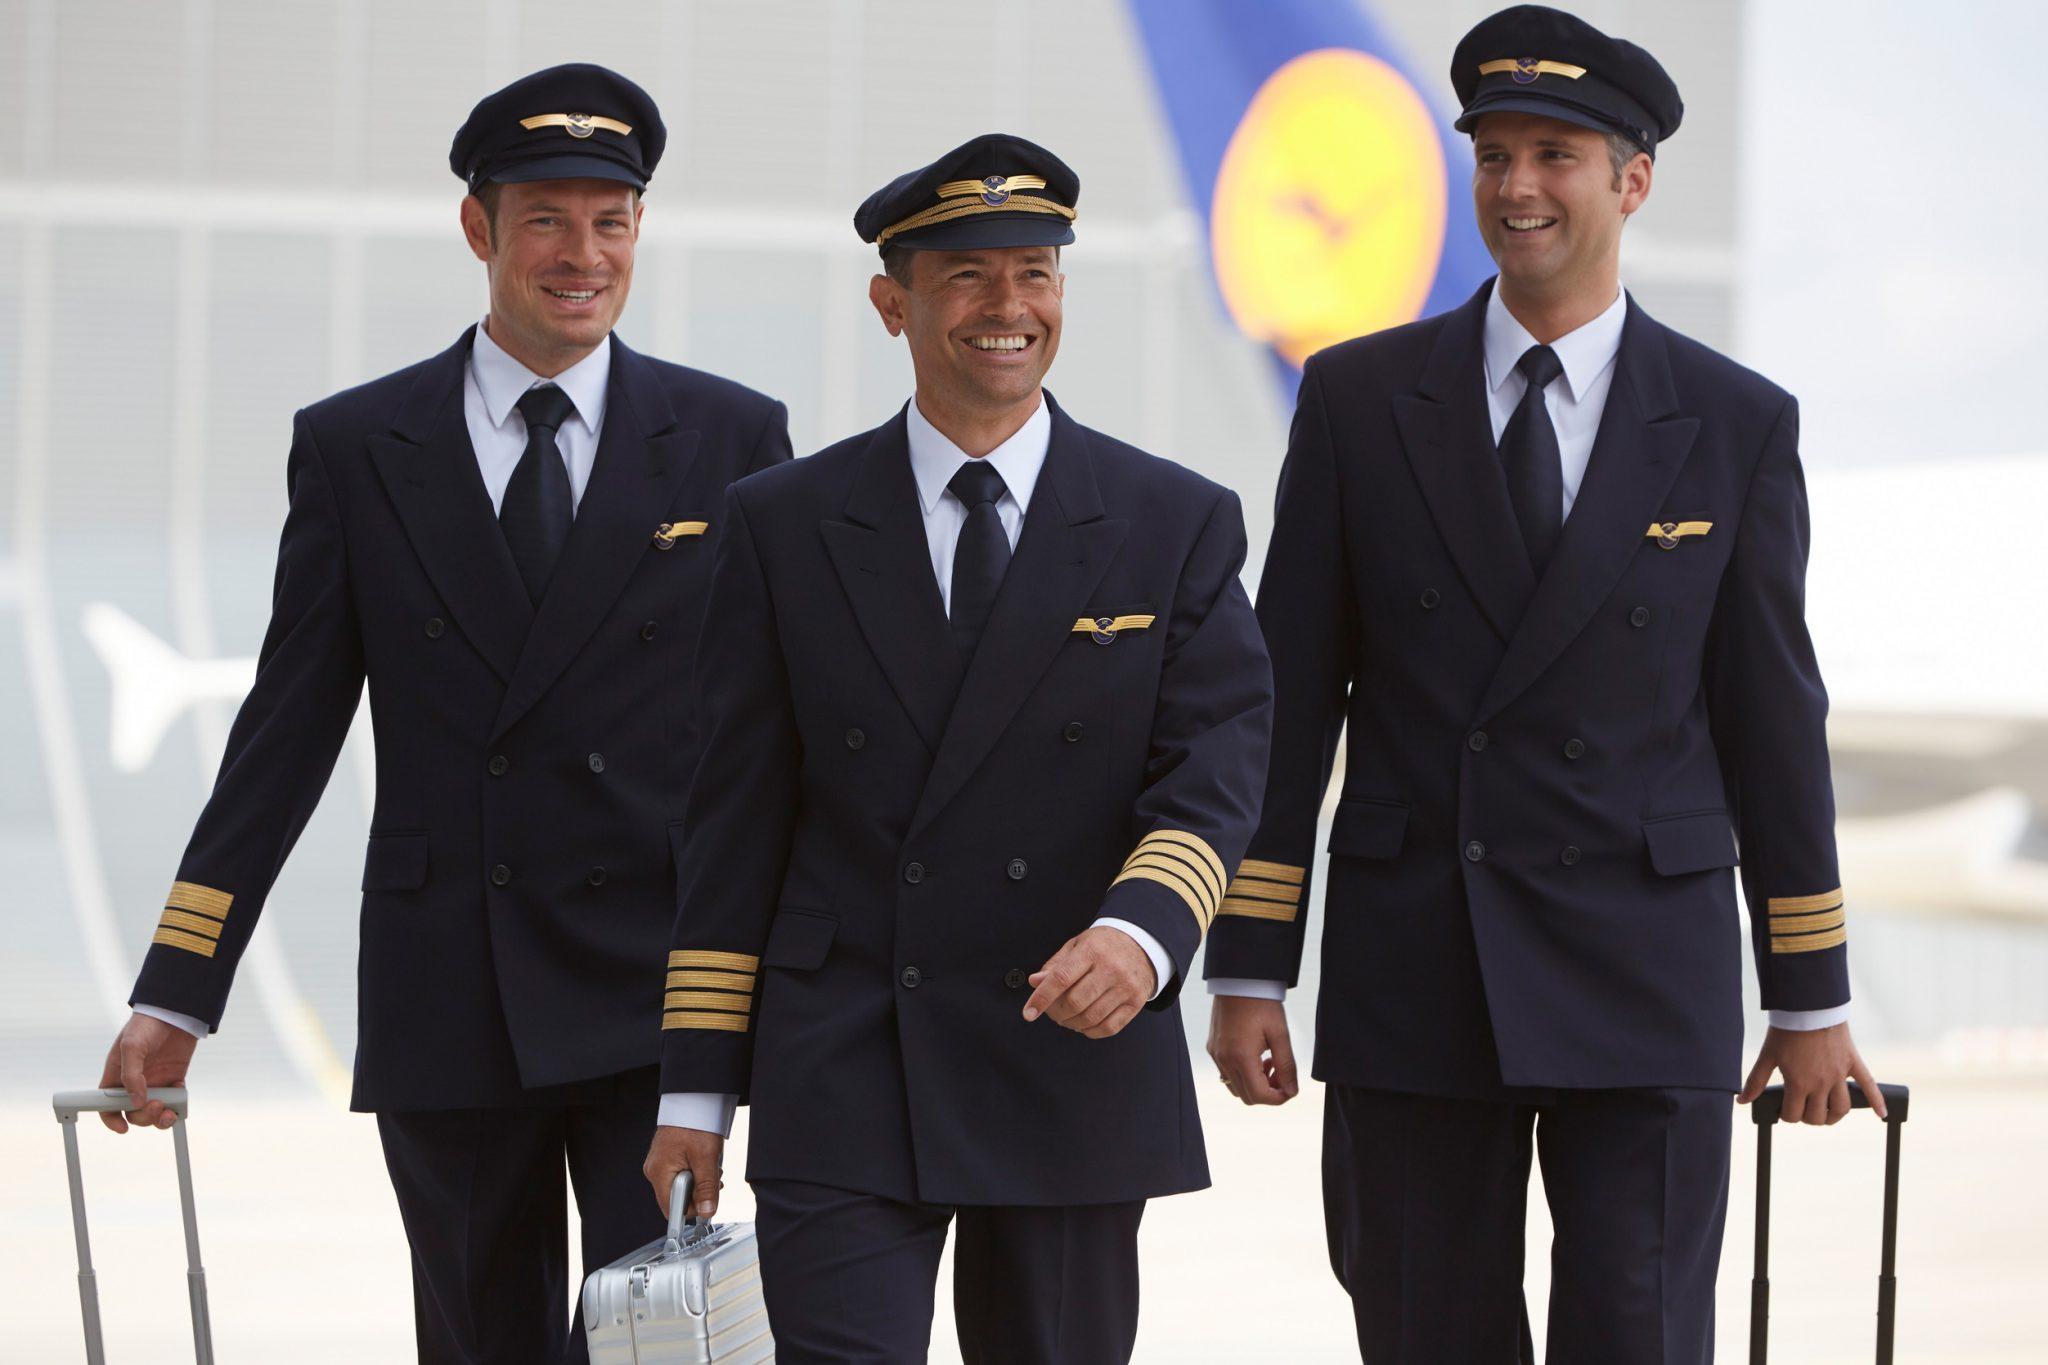 Lufthansa Bildarchiv, FRA CI/C